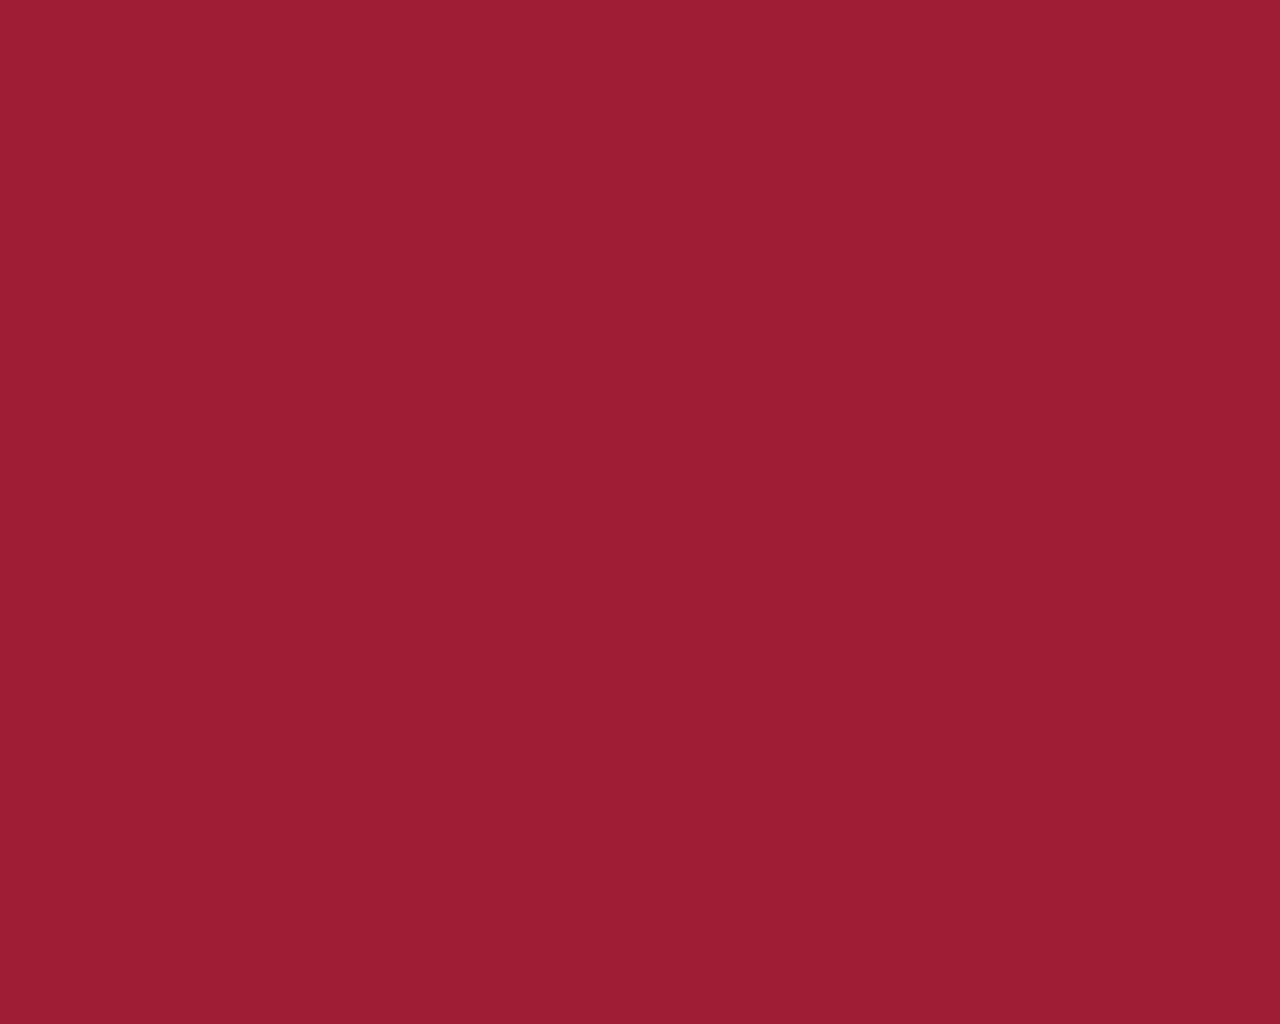 1280x1024 Vivid Burgundy Solid Color Background